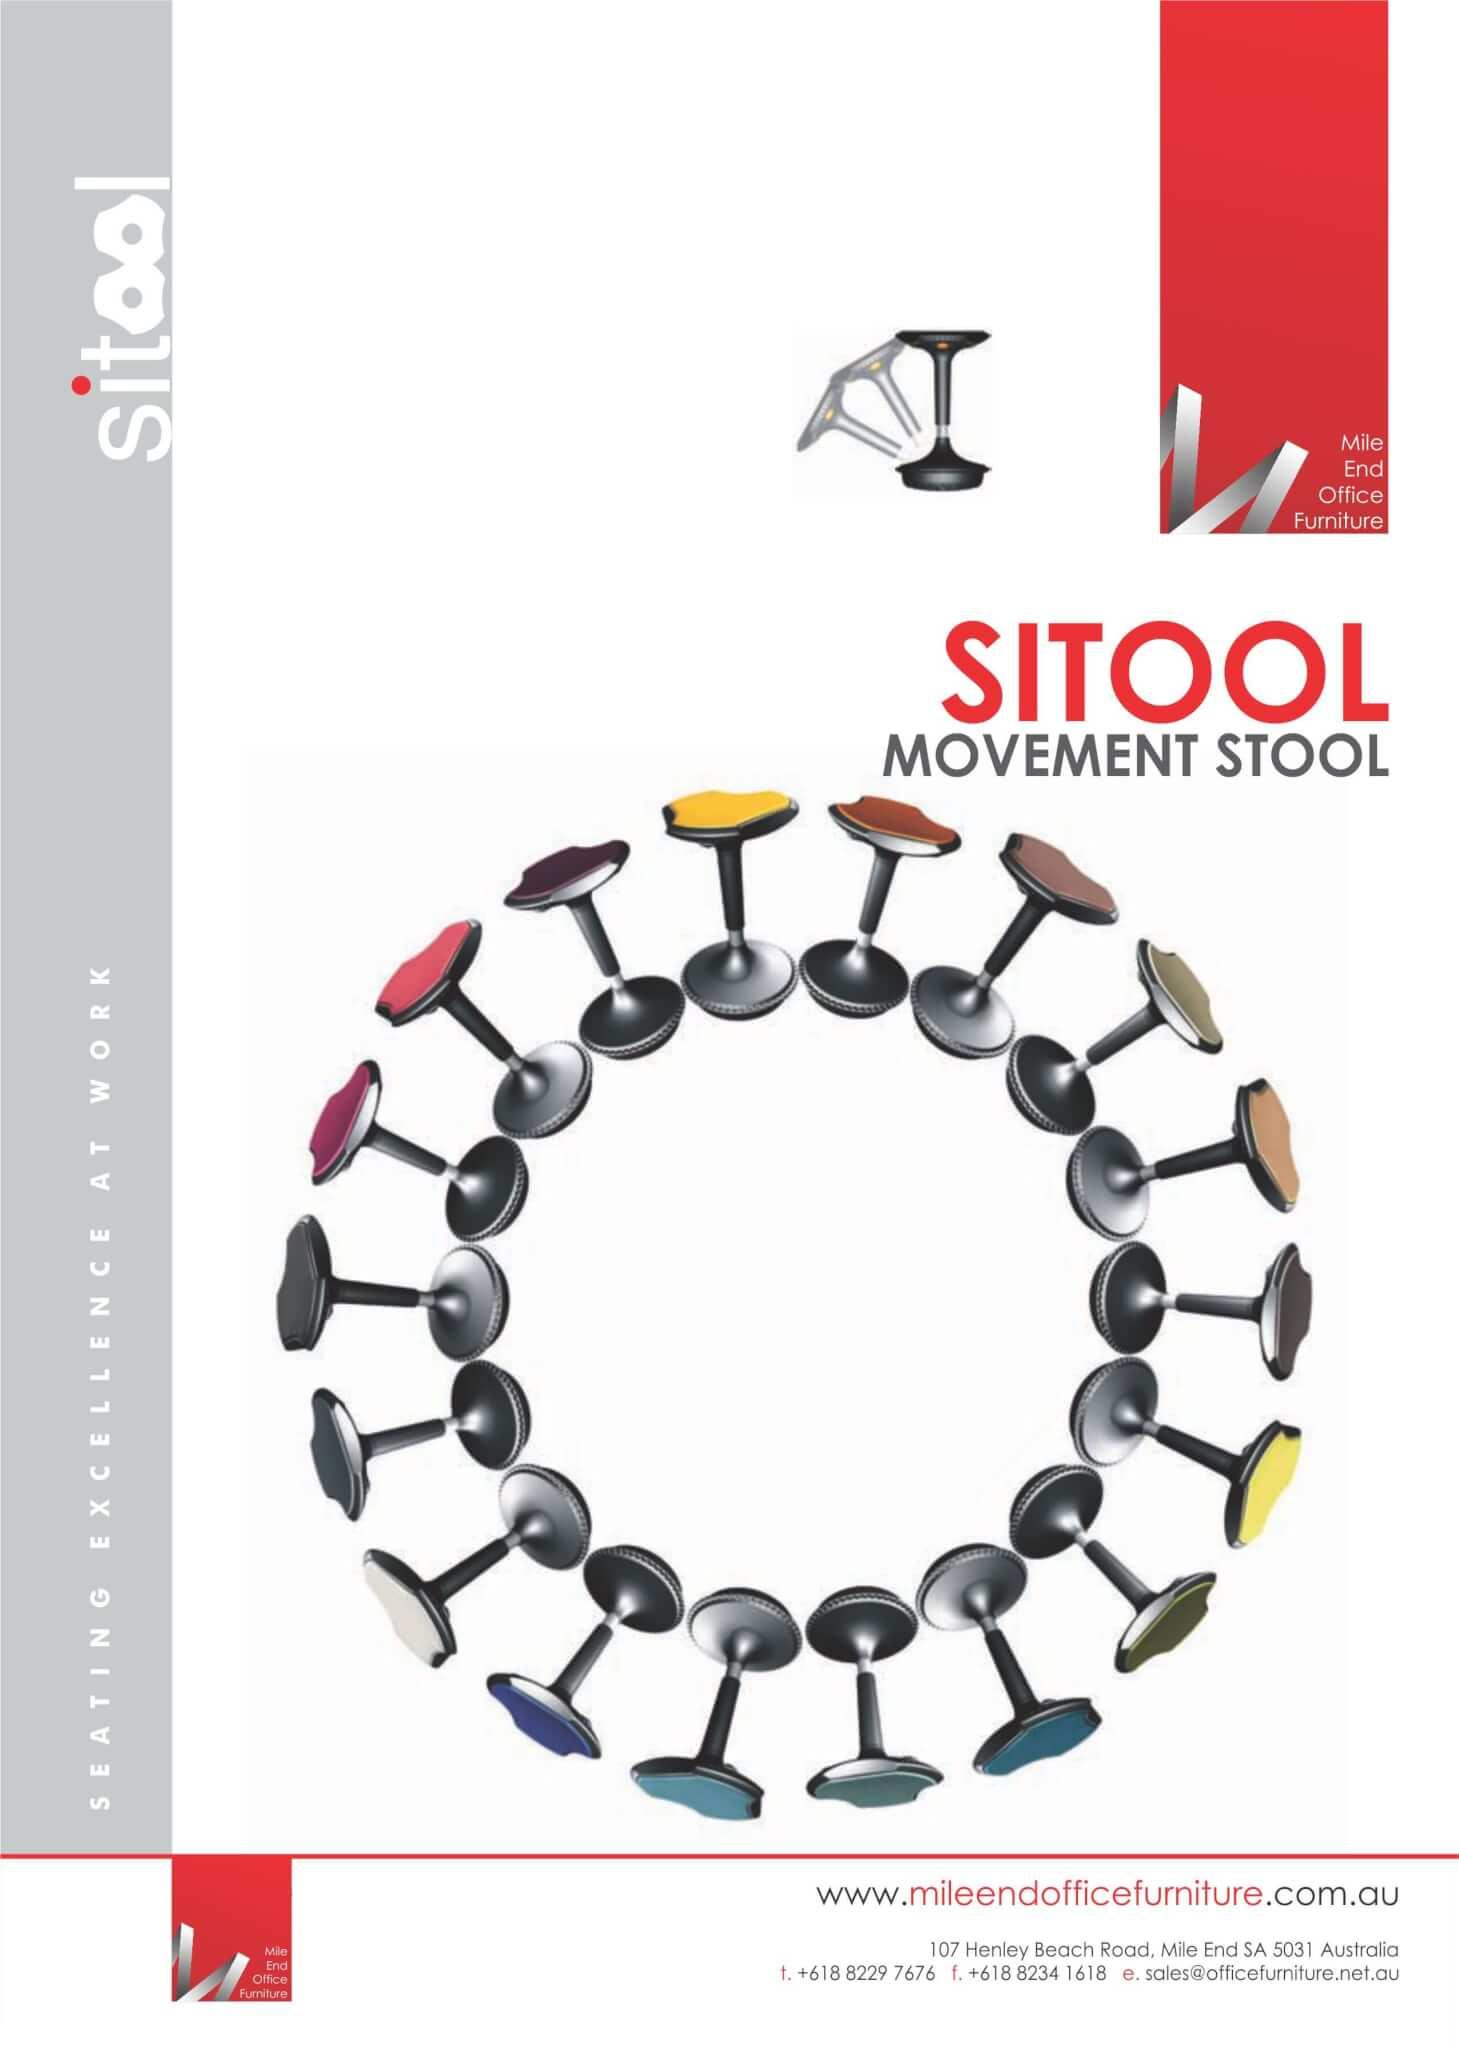 Sitool